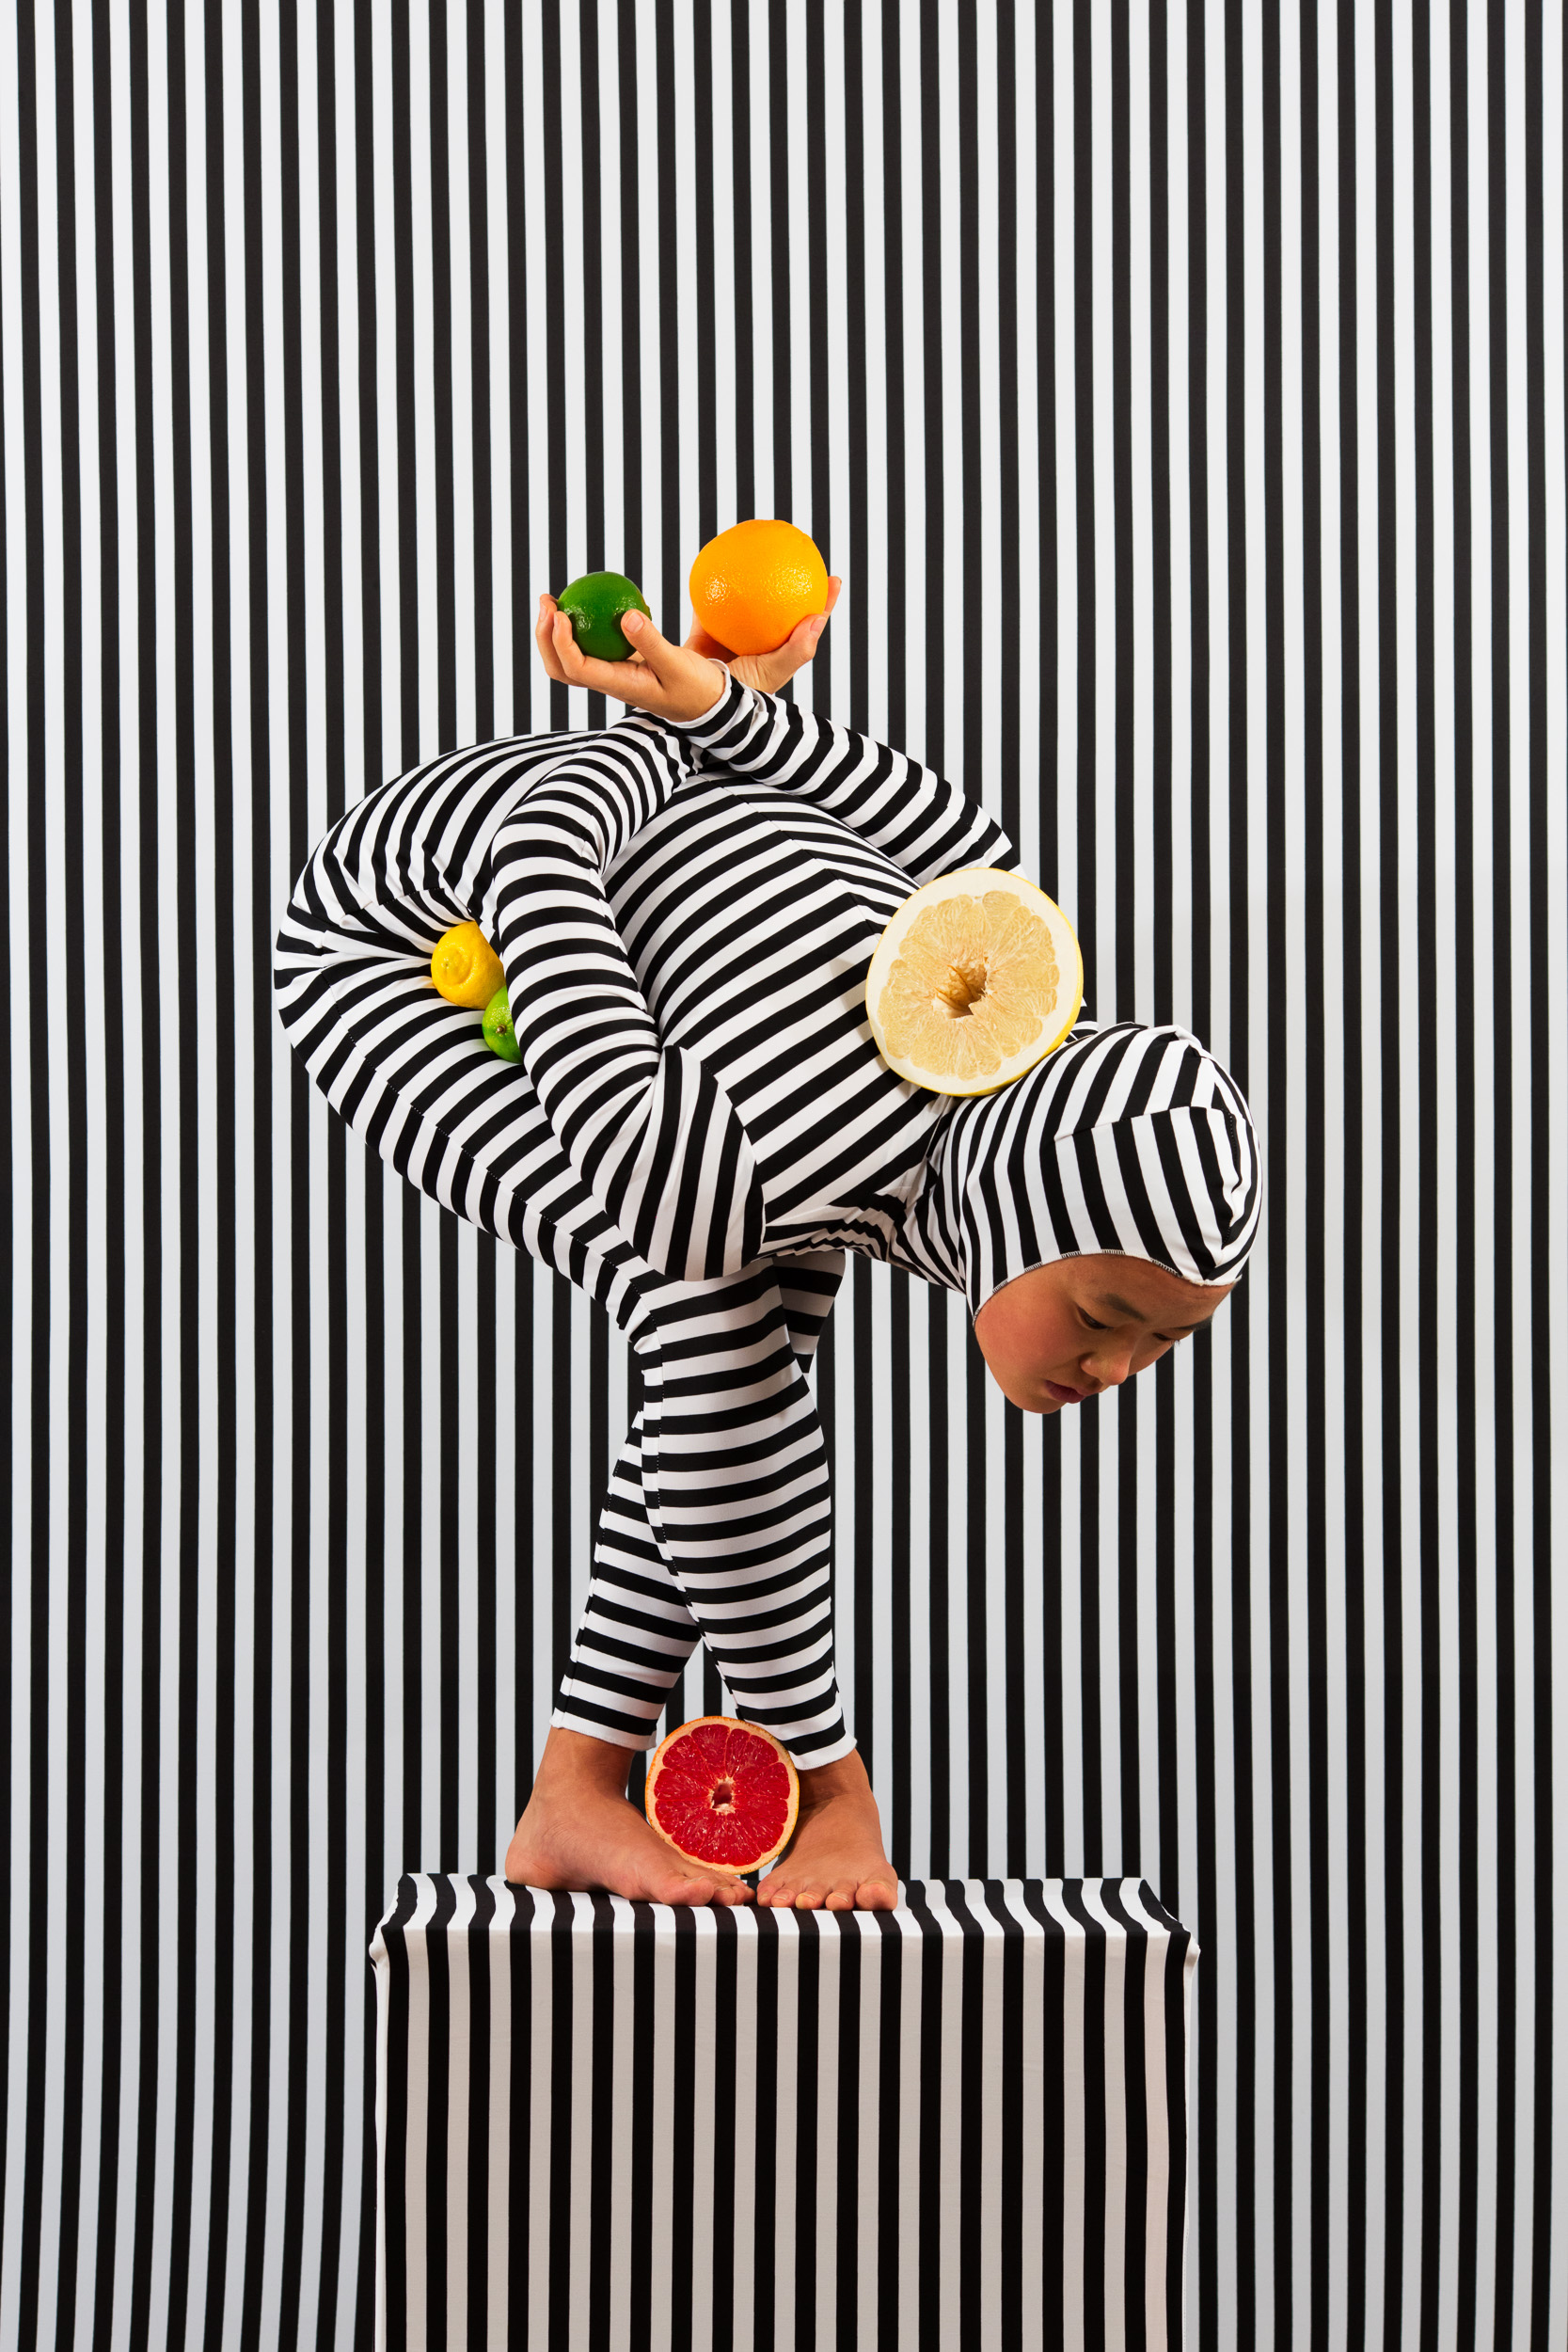 An Arrangement (Stripes Case Study 5)  2018, archival pigment print 91.5 x 61 cm / 36 x 24 in. Edition of 3